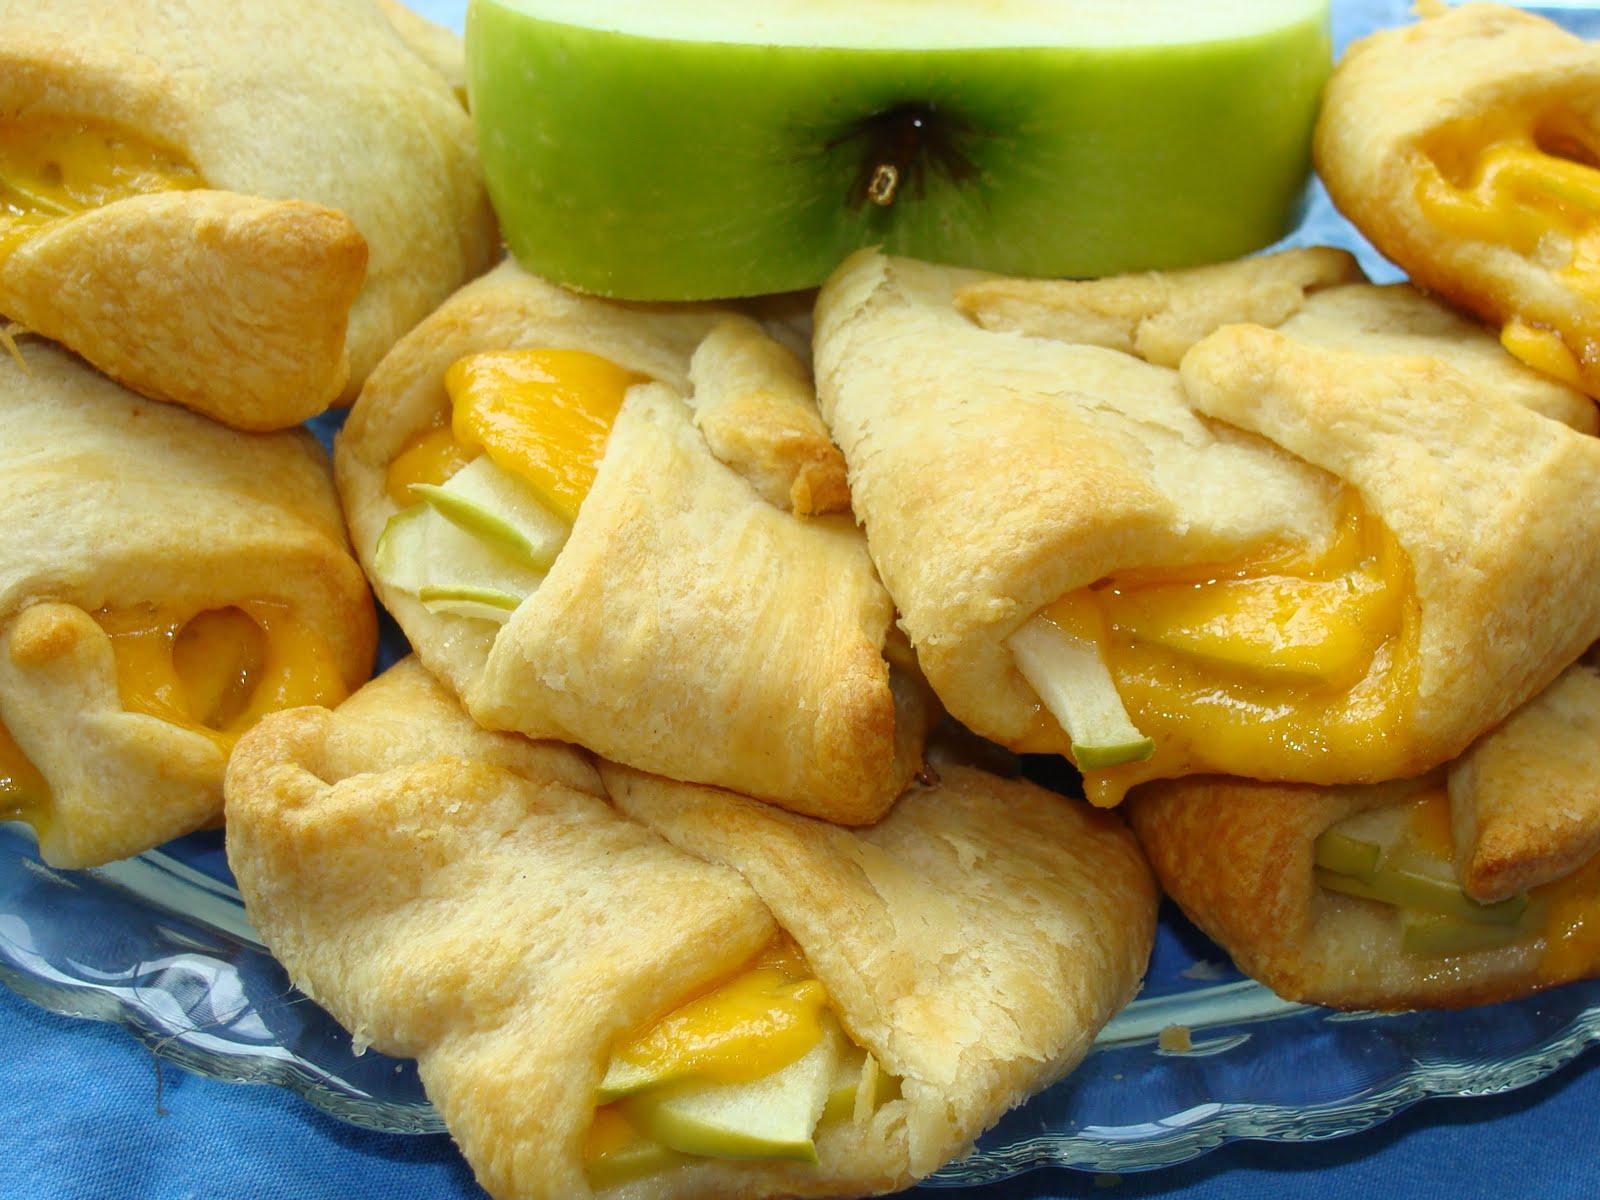 Tummy Temptations: Apple-Cheddar Tarts